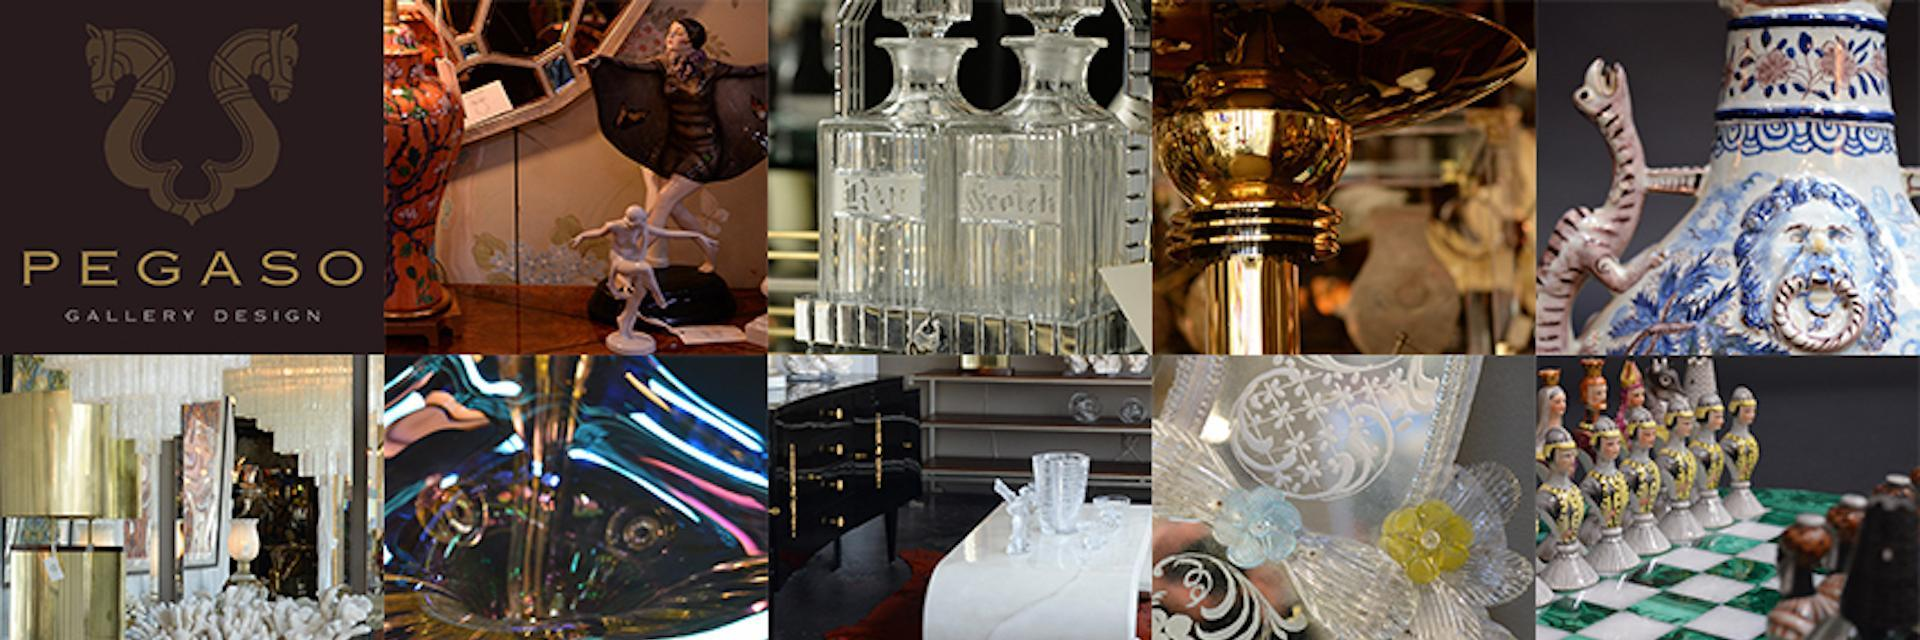 Murano gl floor lamp murano gl floor lamps 173 for at 1stdibs - Show More